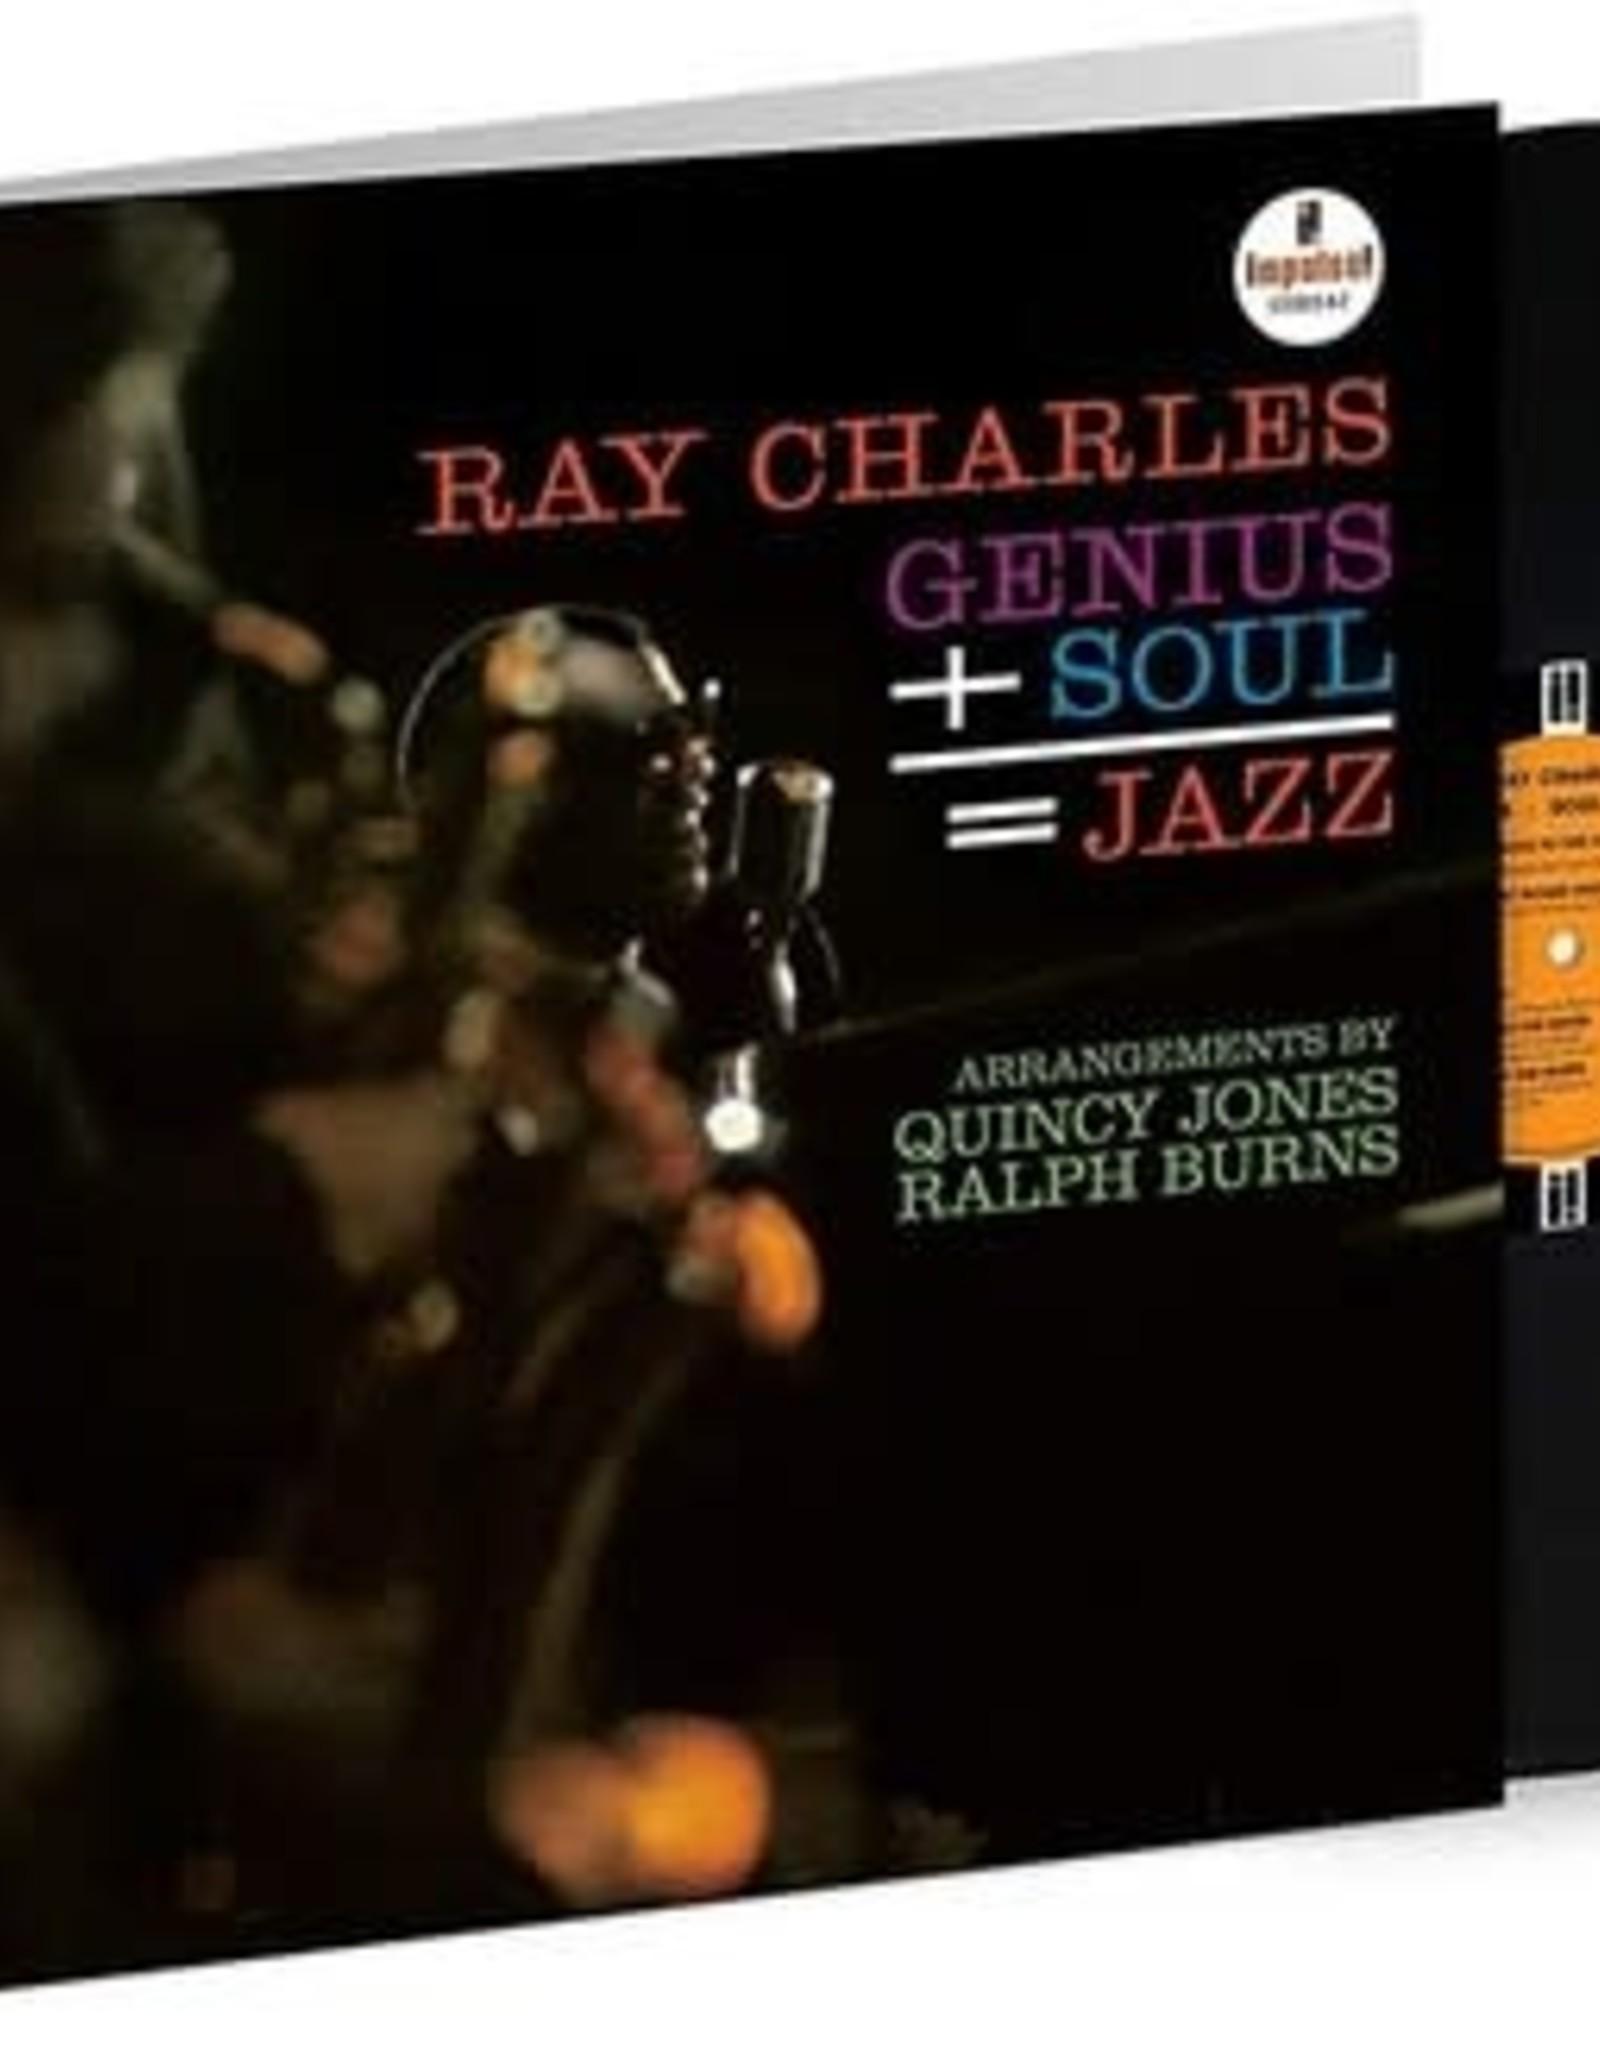 Ray Charles - Genius + Soul = Jazz (Analog Master)